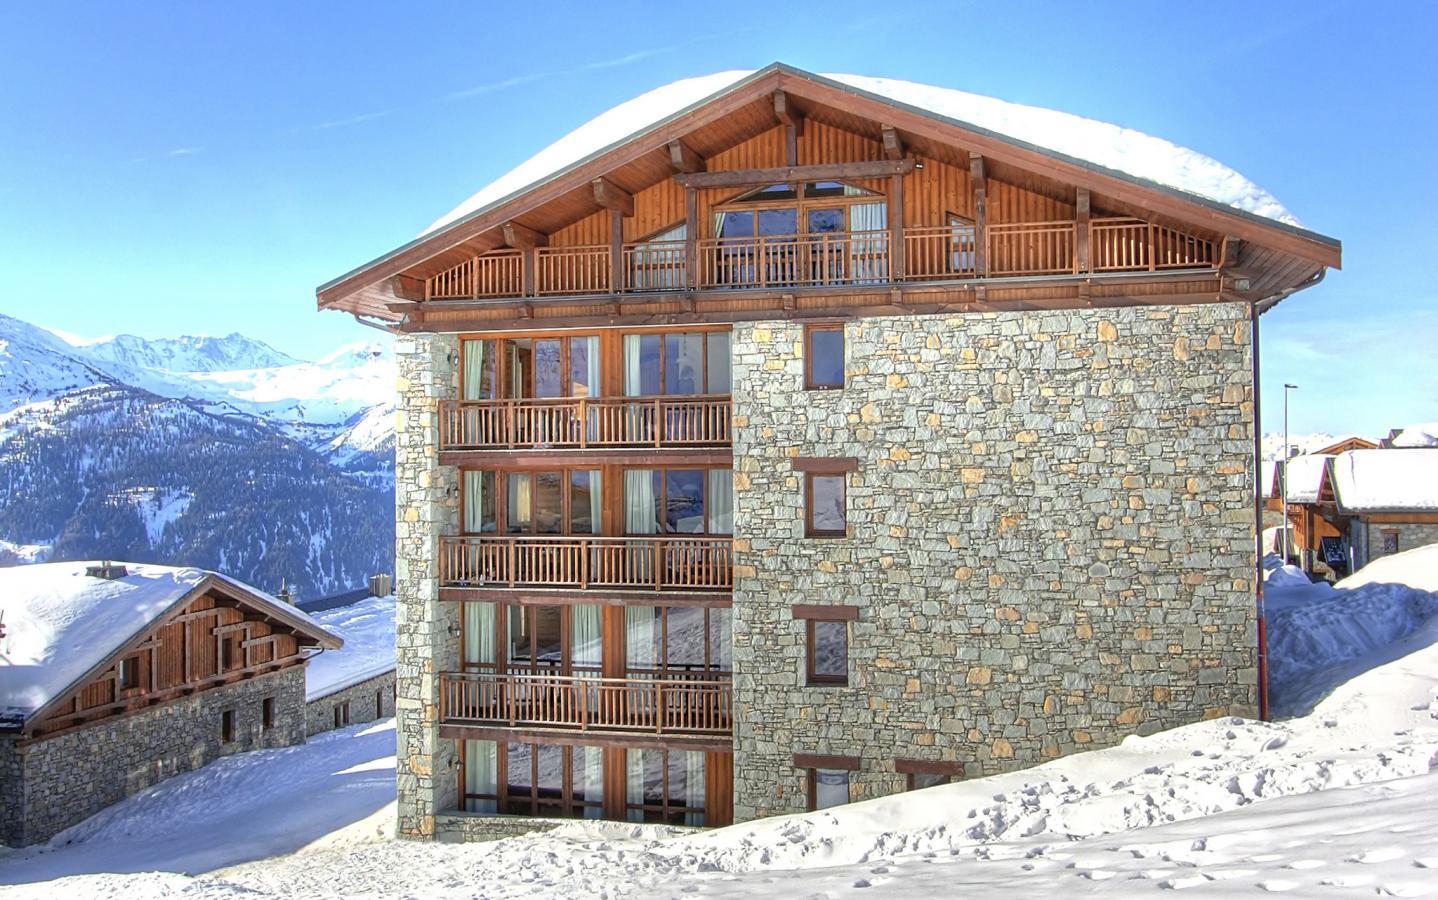 les balcons de la rosi re 10 la rosi re location vacances ski la rosi re ski planet. Black Bedroom Furniture Sets. Home Design Ideas